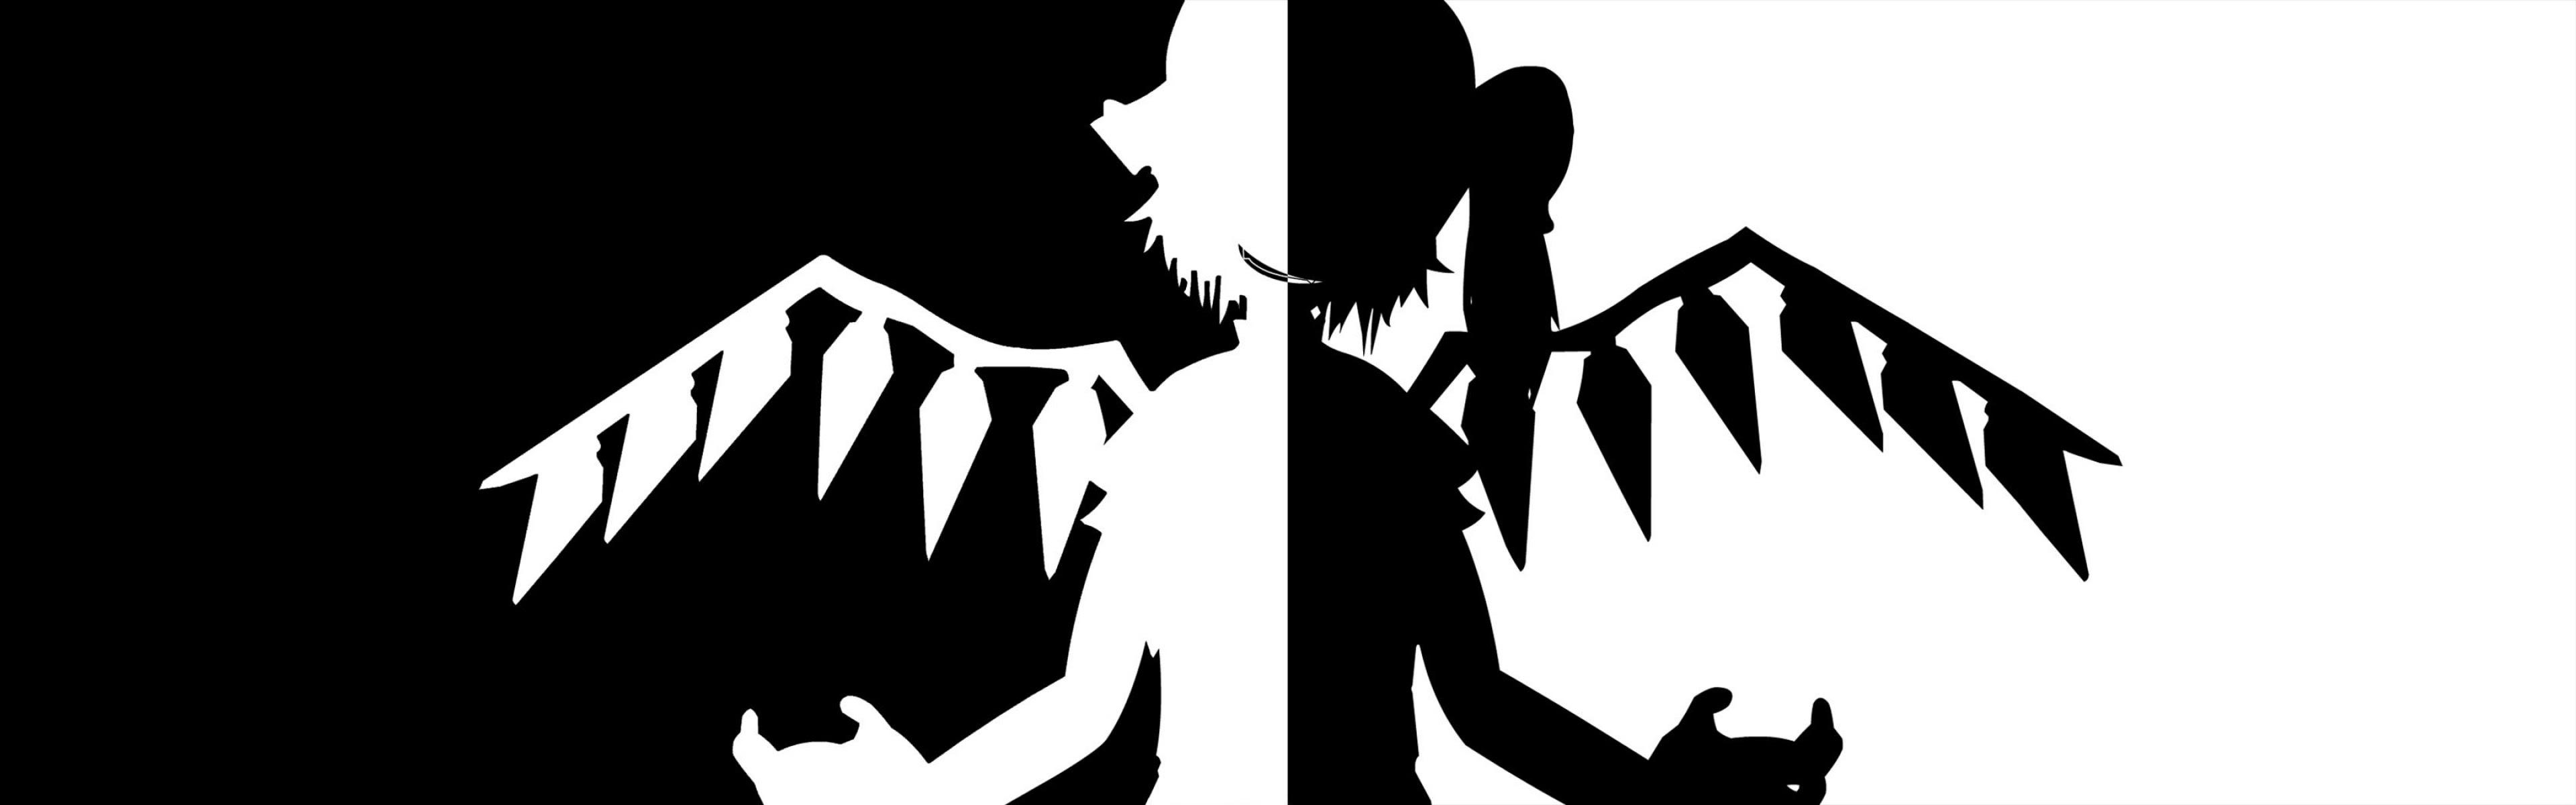 Dual Monitor Wallpaper Anime Sf Wallpaper